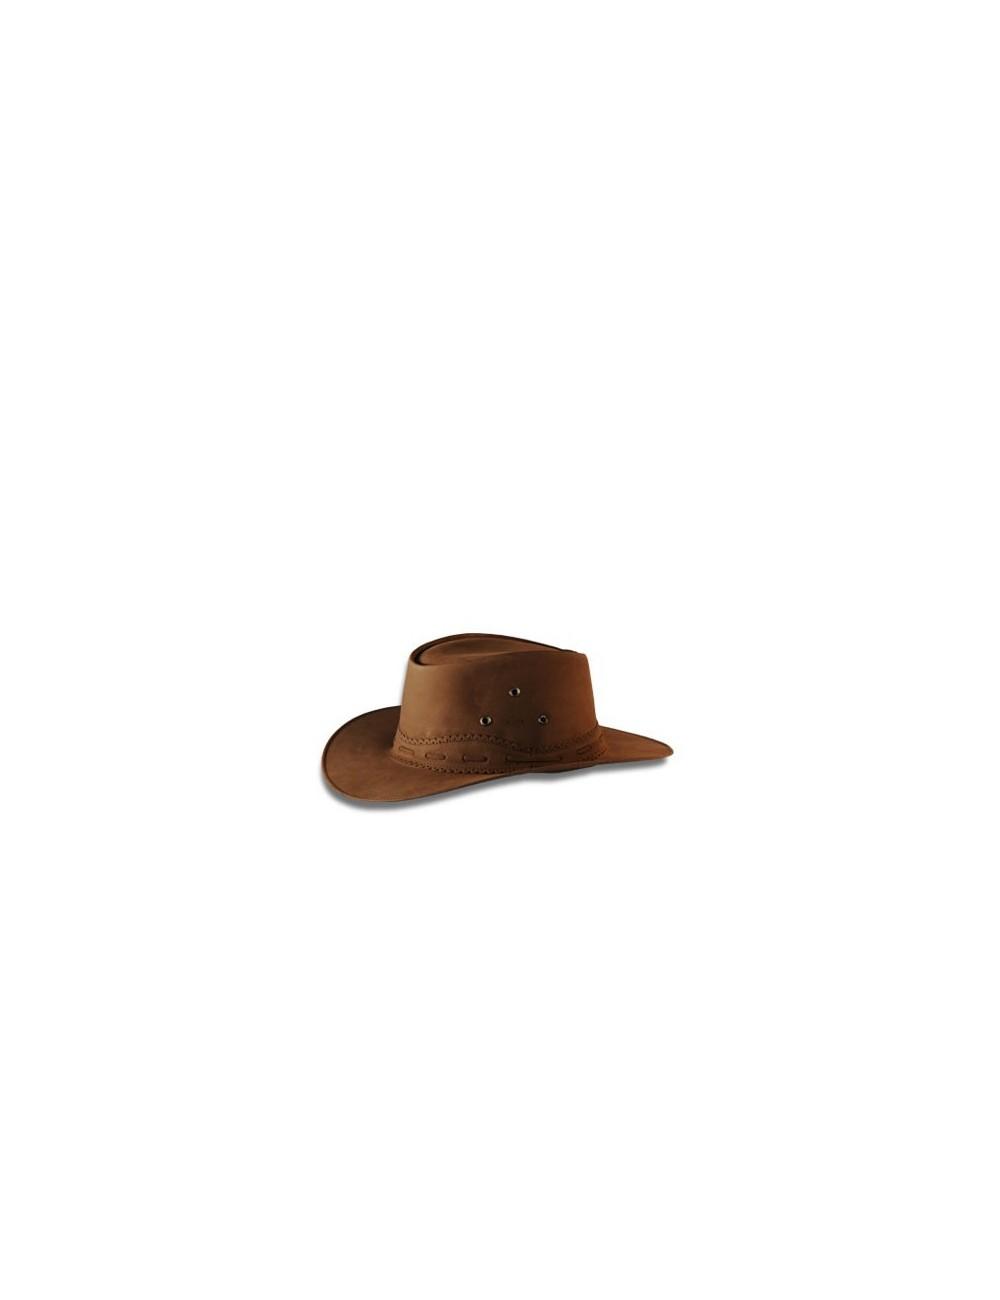 Chapeaux western cuir - Chapeau country cuir nubuck marron